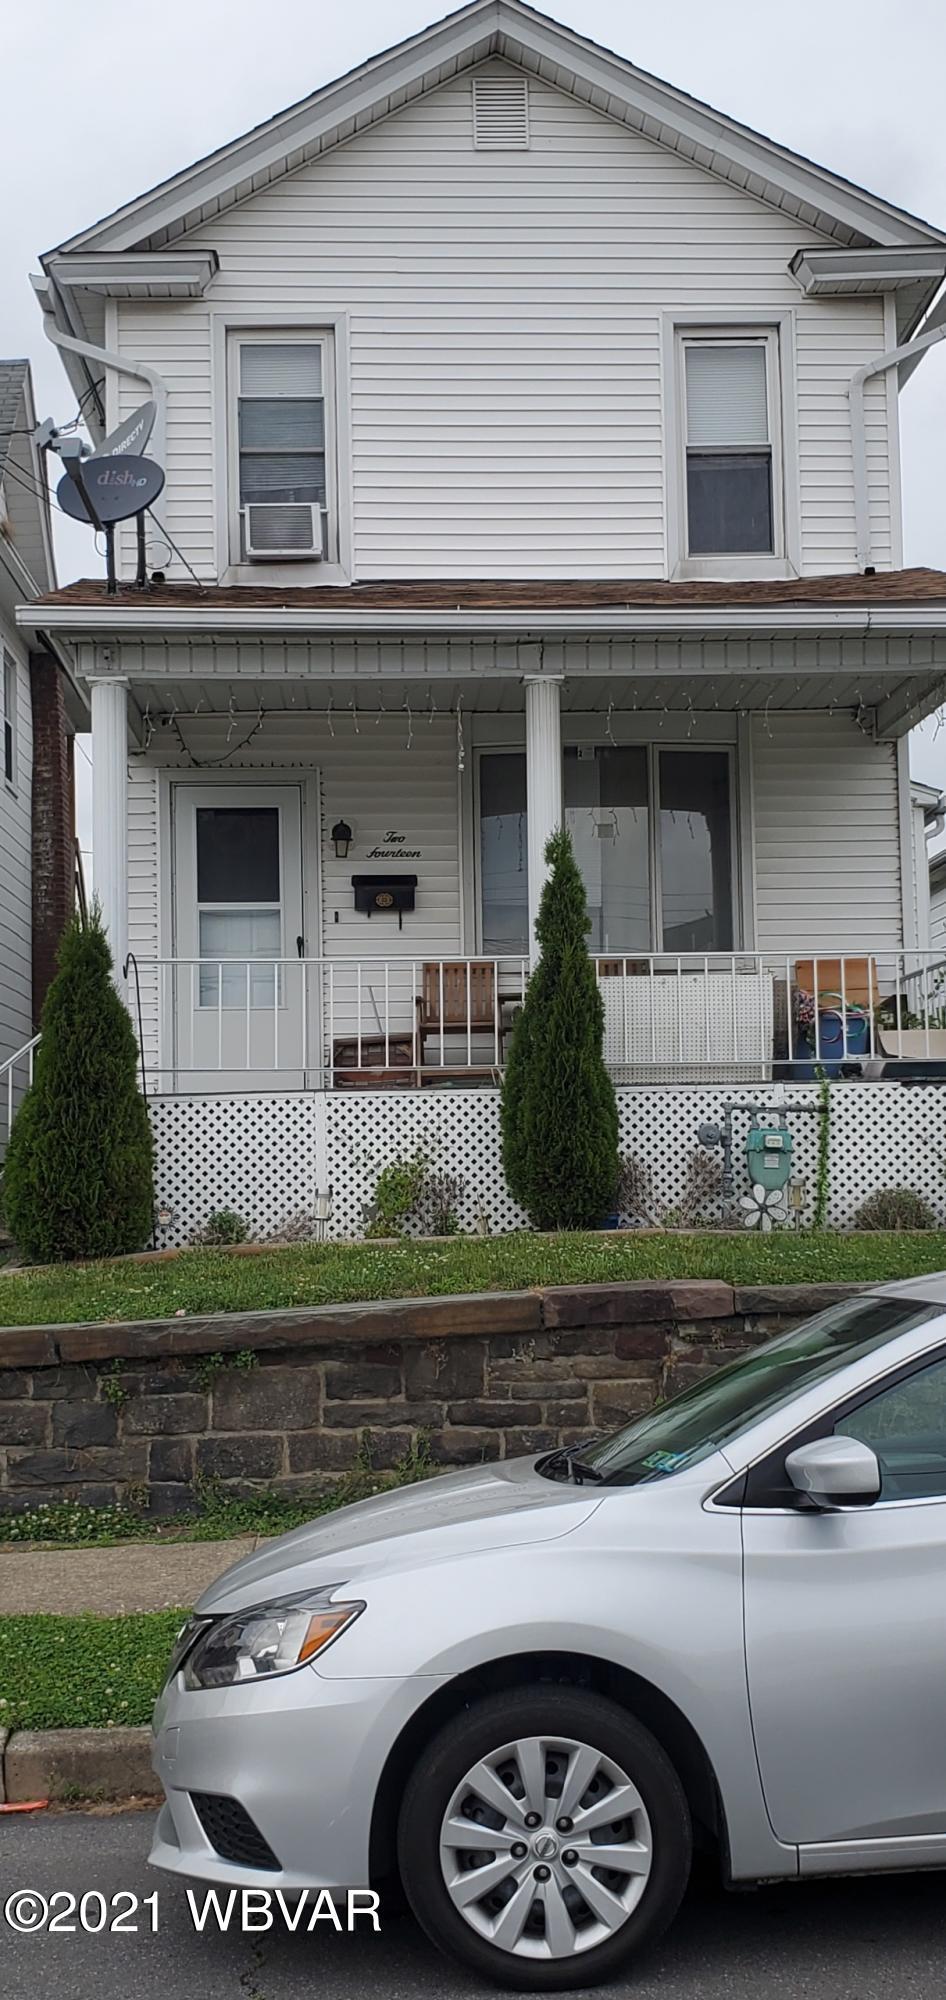 214 BROAD STREET, Nanticoke, PA 18634, 3 Bedrooms Bedrooms, ,Residential,For sale,BROAD,WB-92796